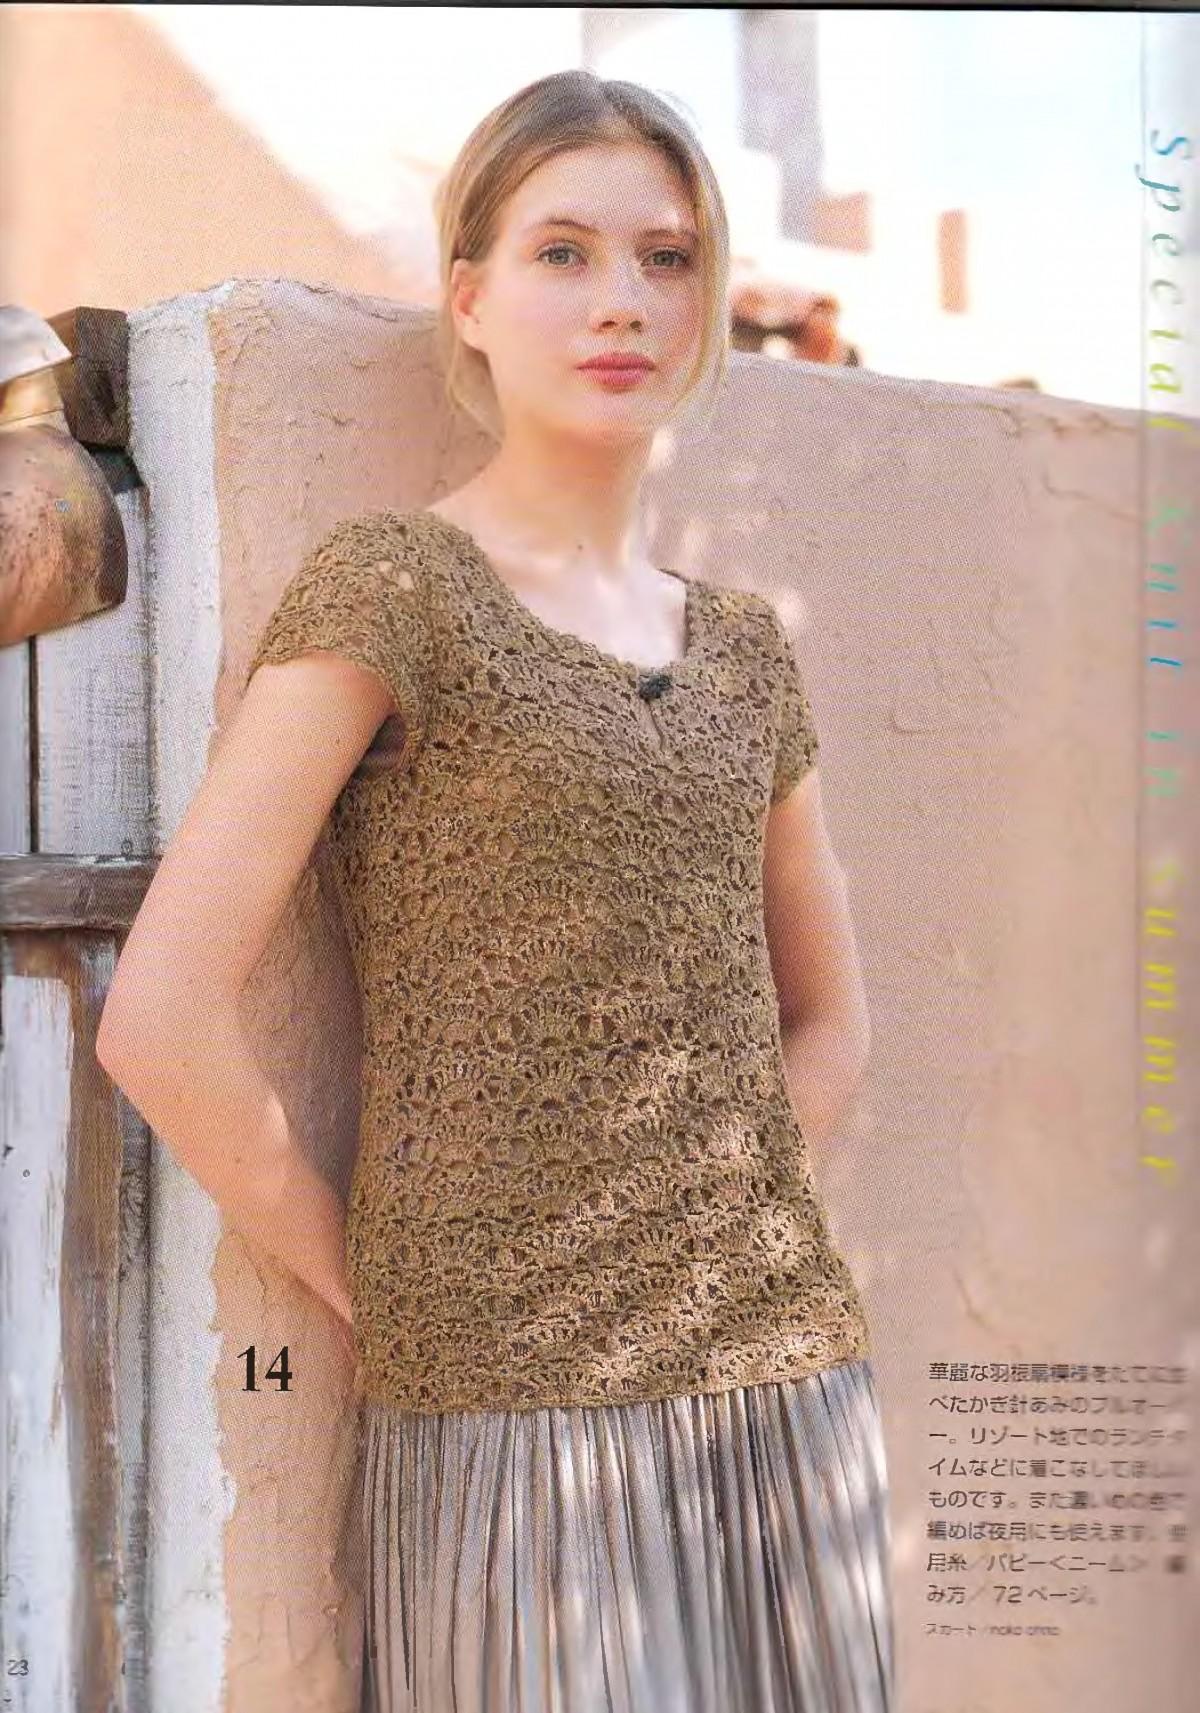 Lets-knit-series-NV4359-2008-Spring-Summer-sp-kr_21.jpg